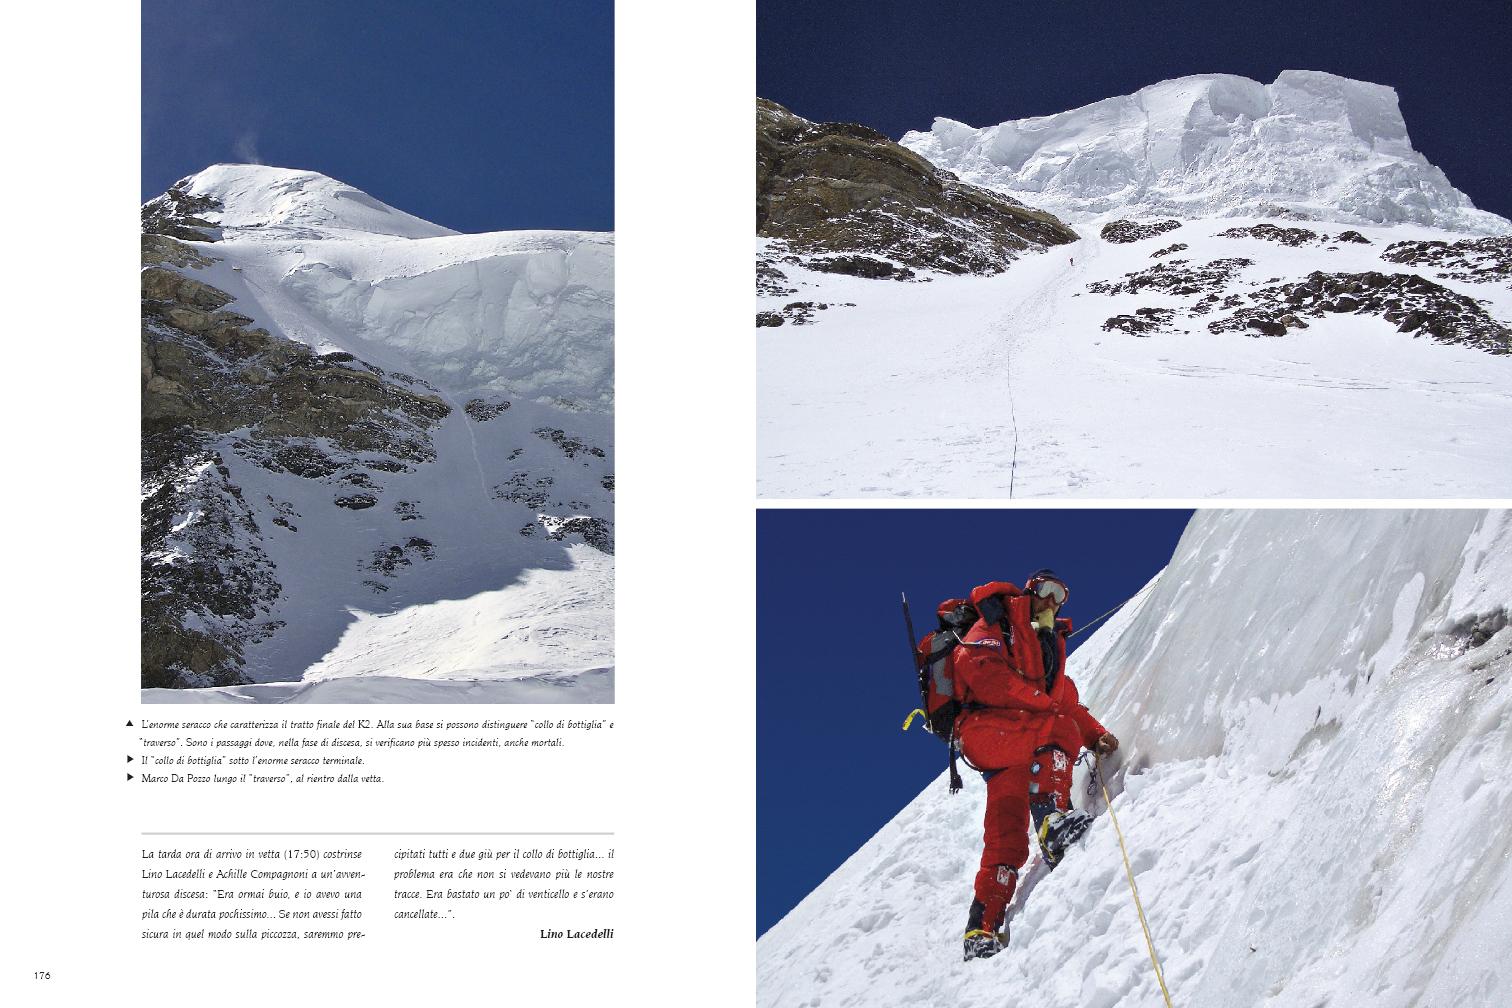 K2 EXPEDITION 1954-2004 Giuseppe Ghedina Fotografo - 090.jpg